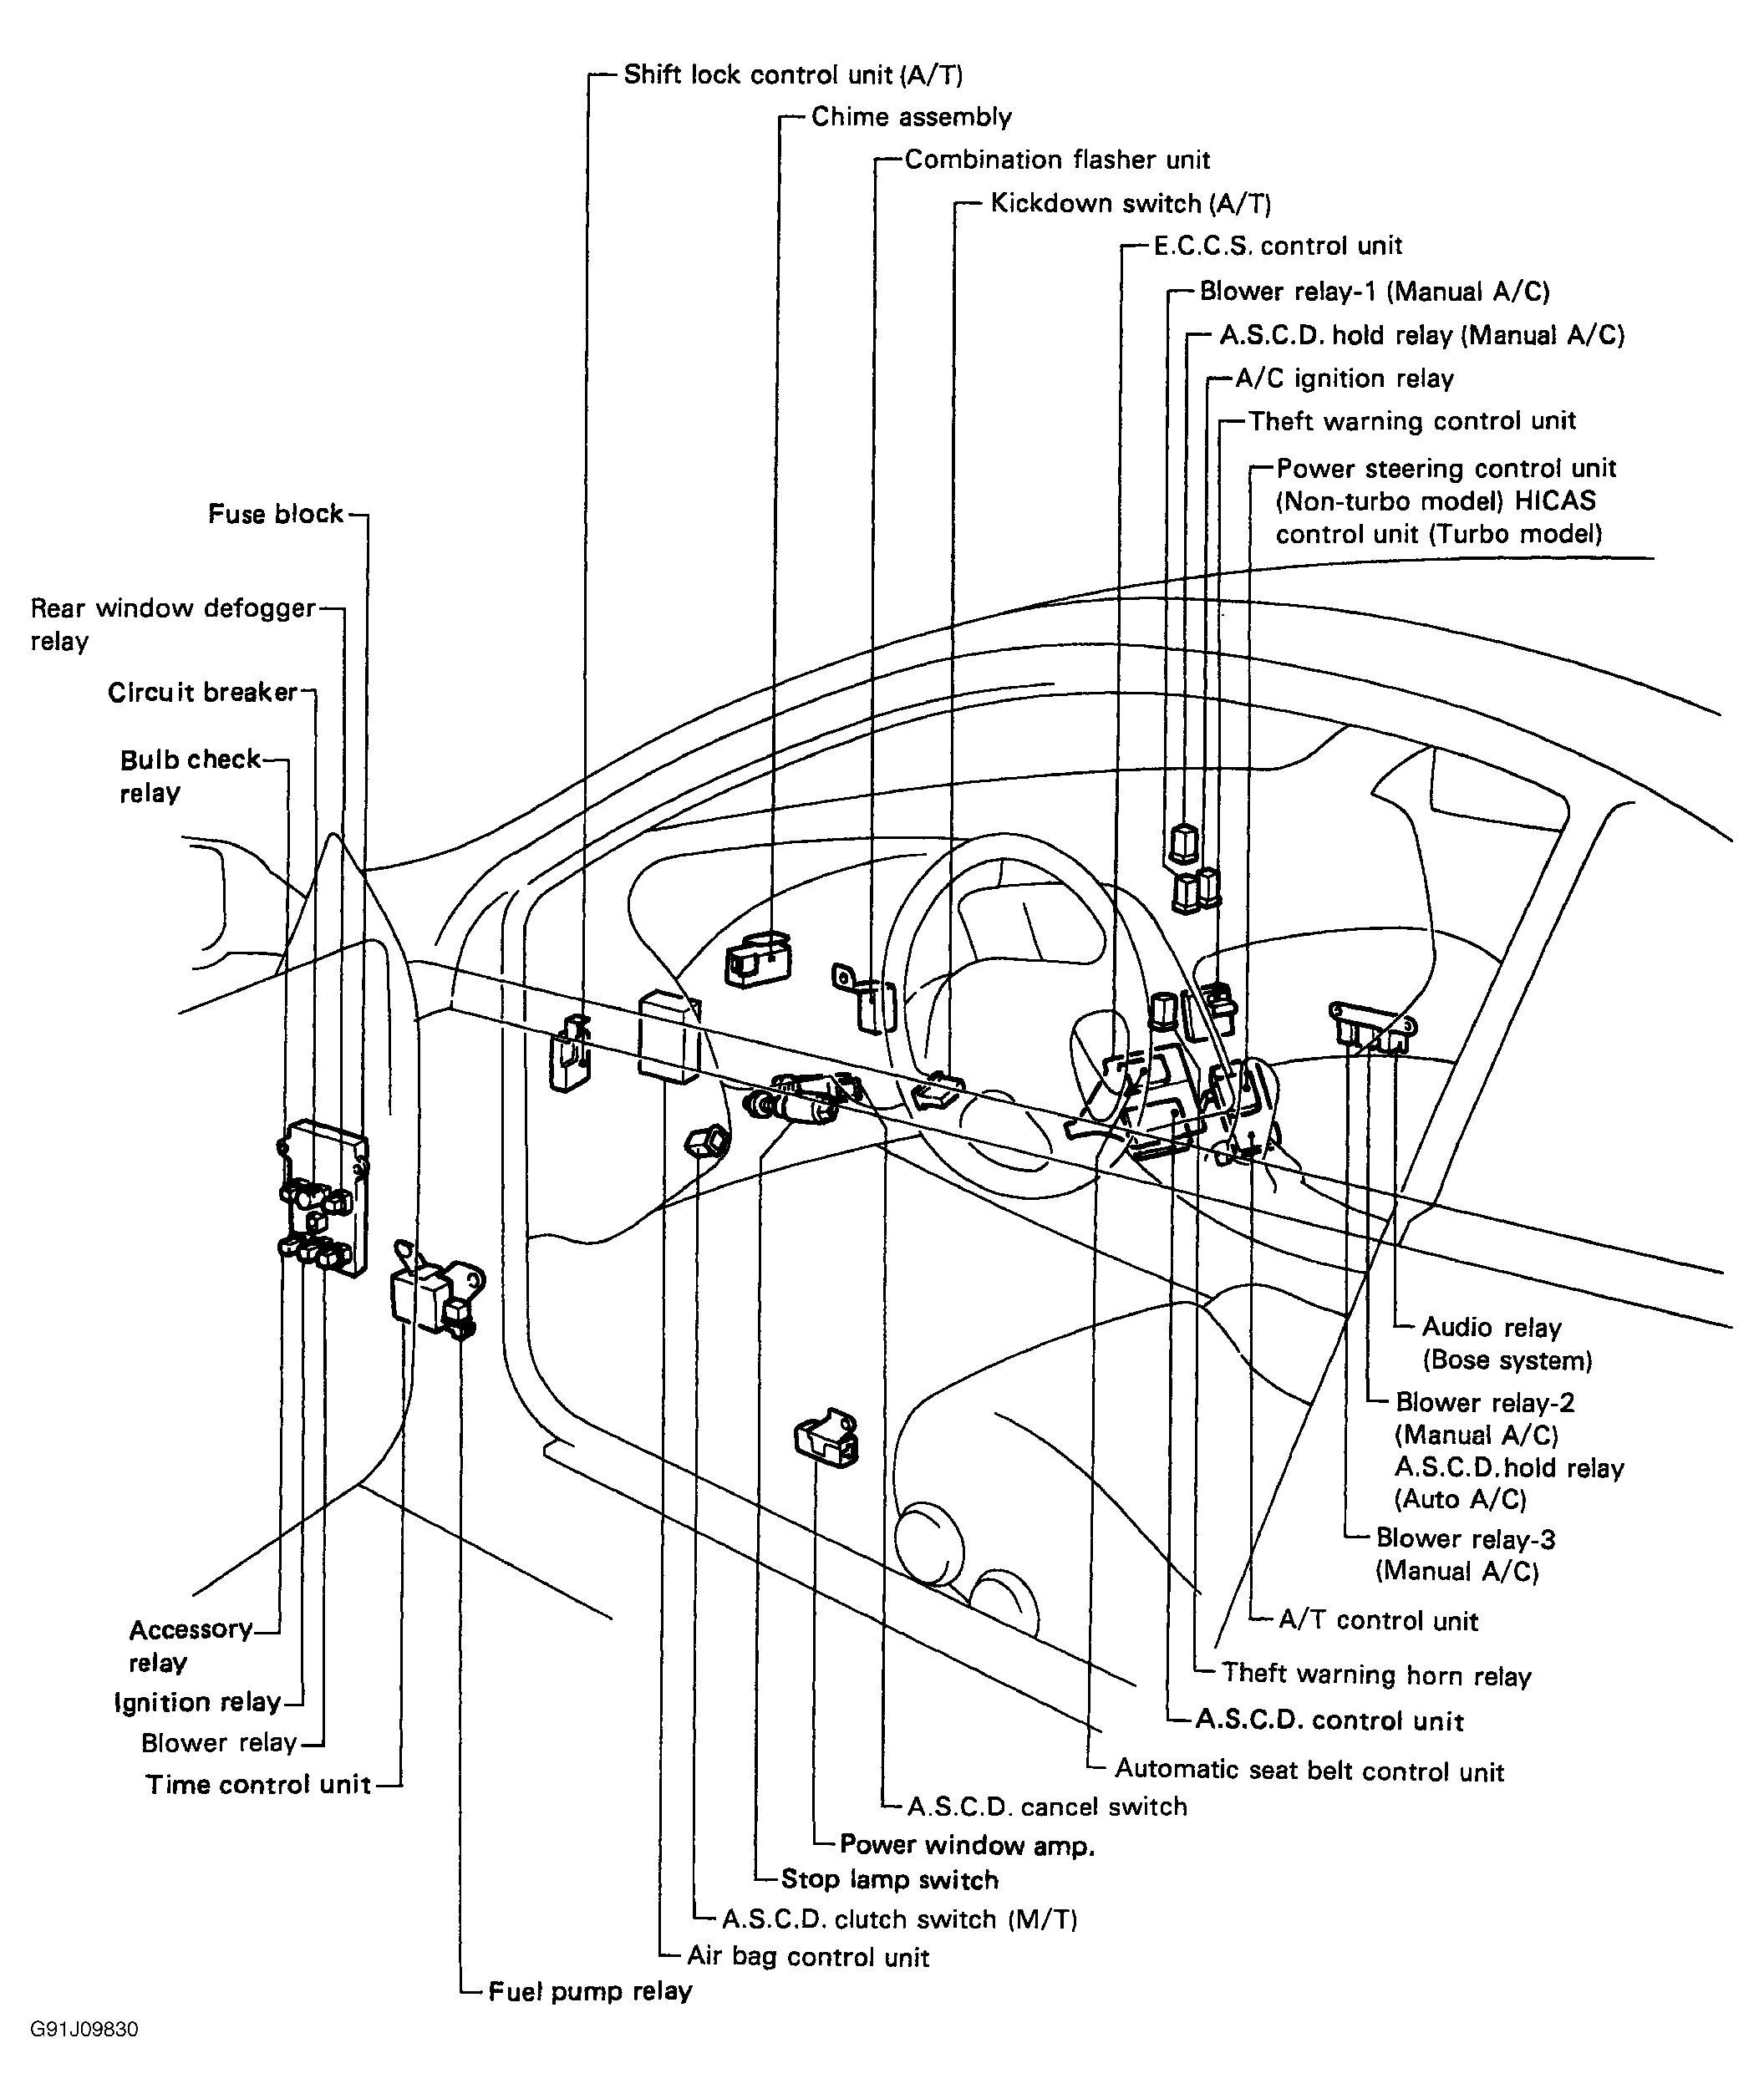 300zx radio diagram 1990 nissan 300zx wiring harness diagram roti www kultur im  1990 nissan 300zx wiring harness